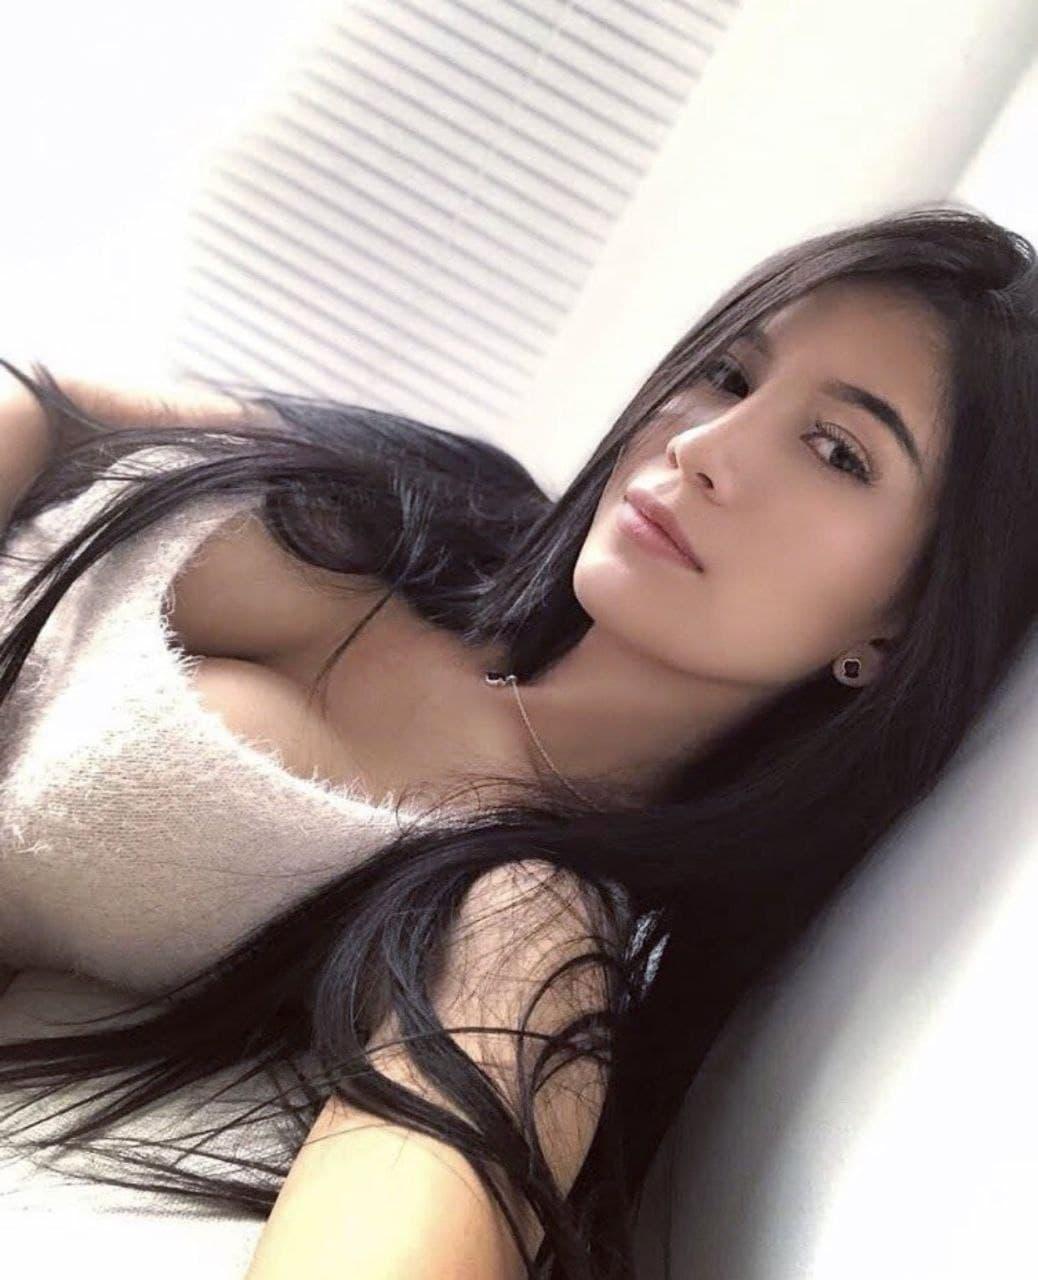 Sweet Latina girl @emilyortiz nudes